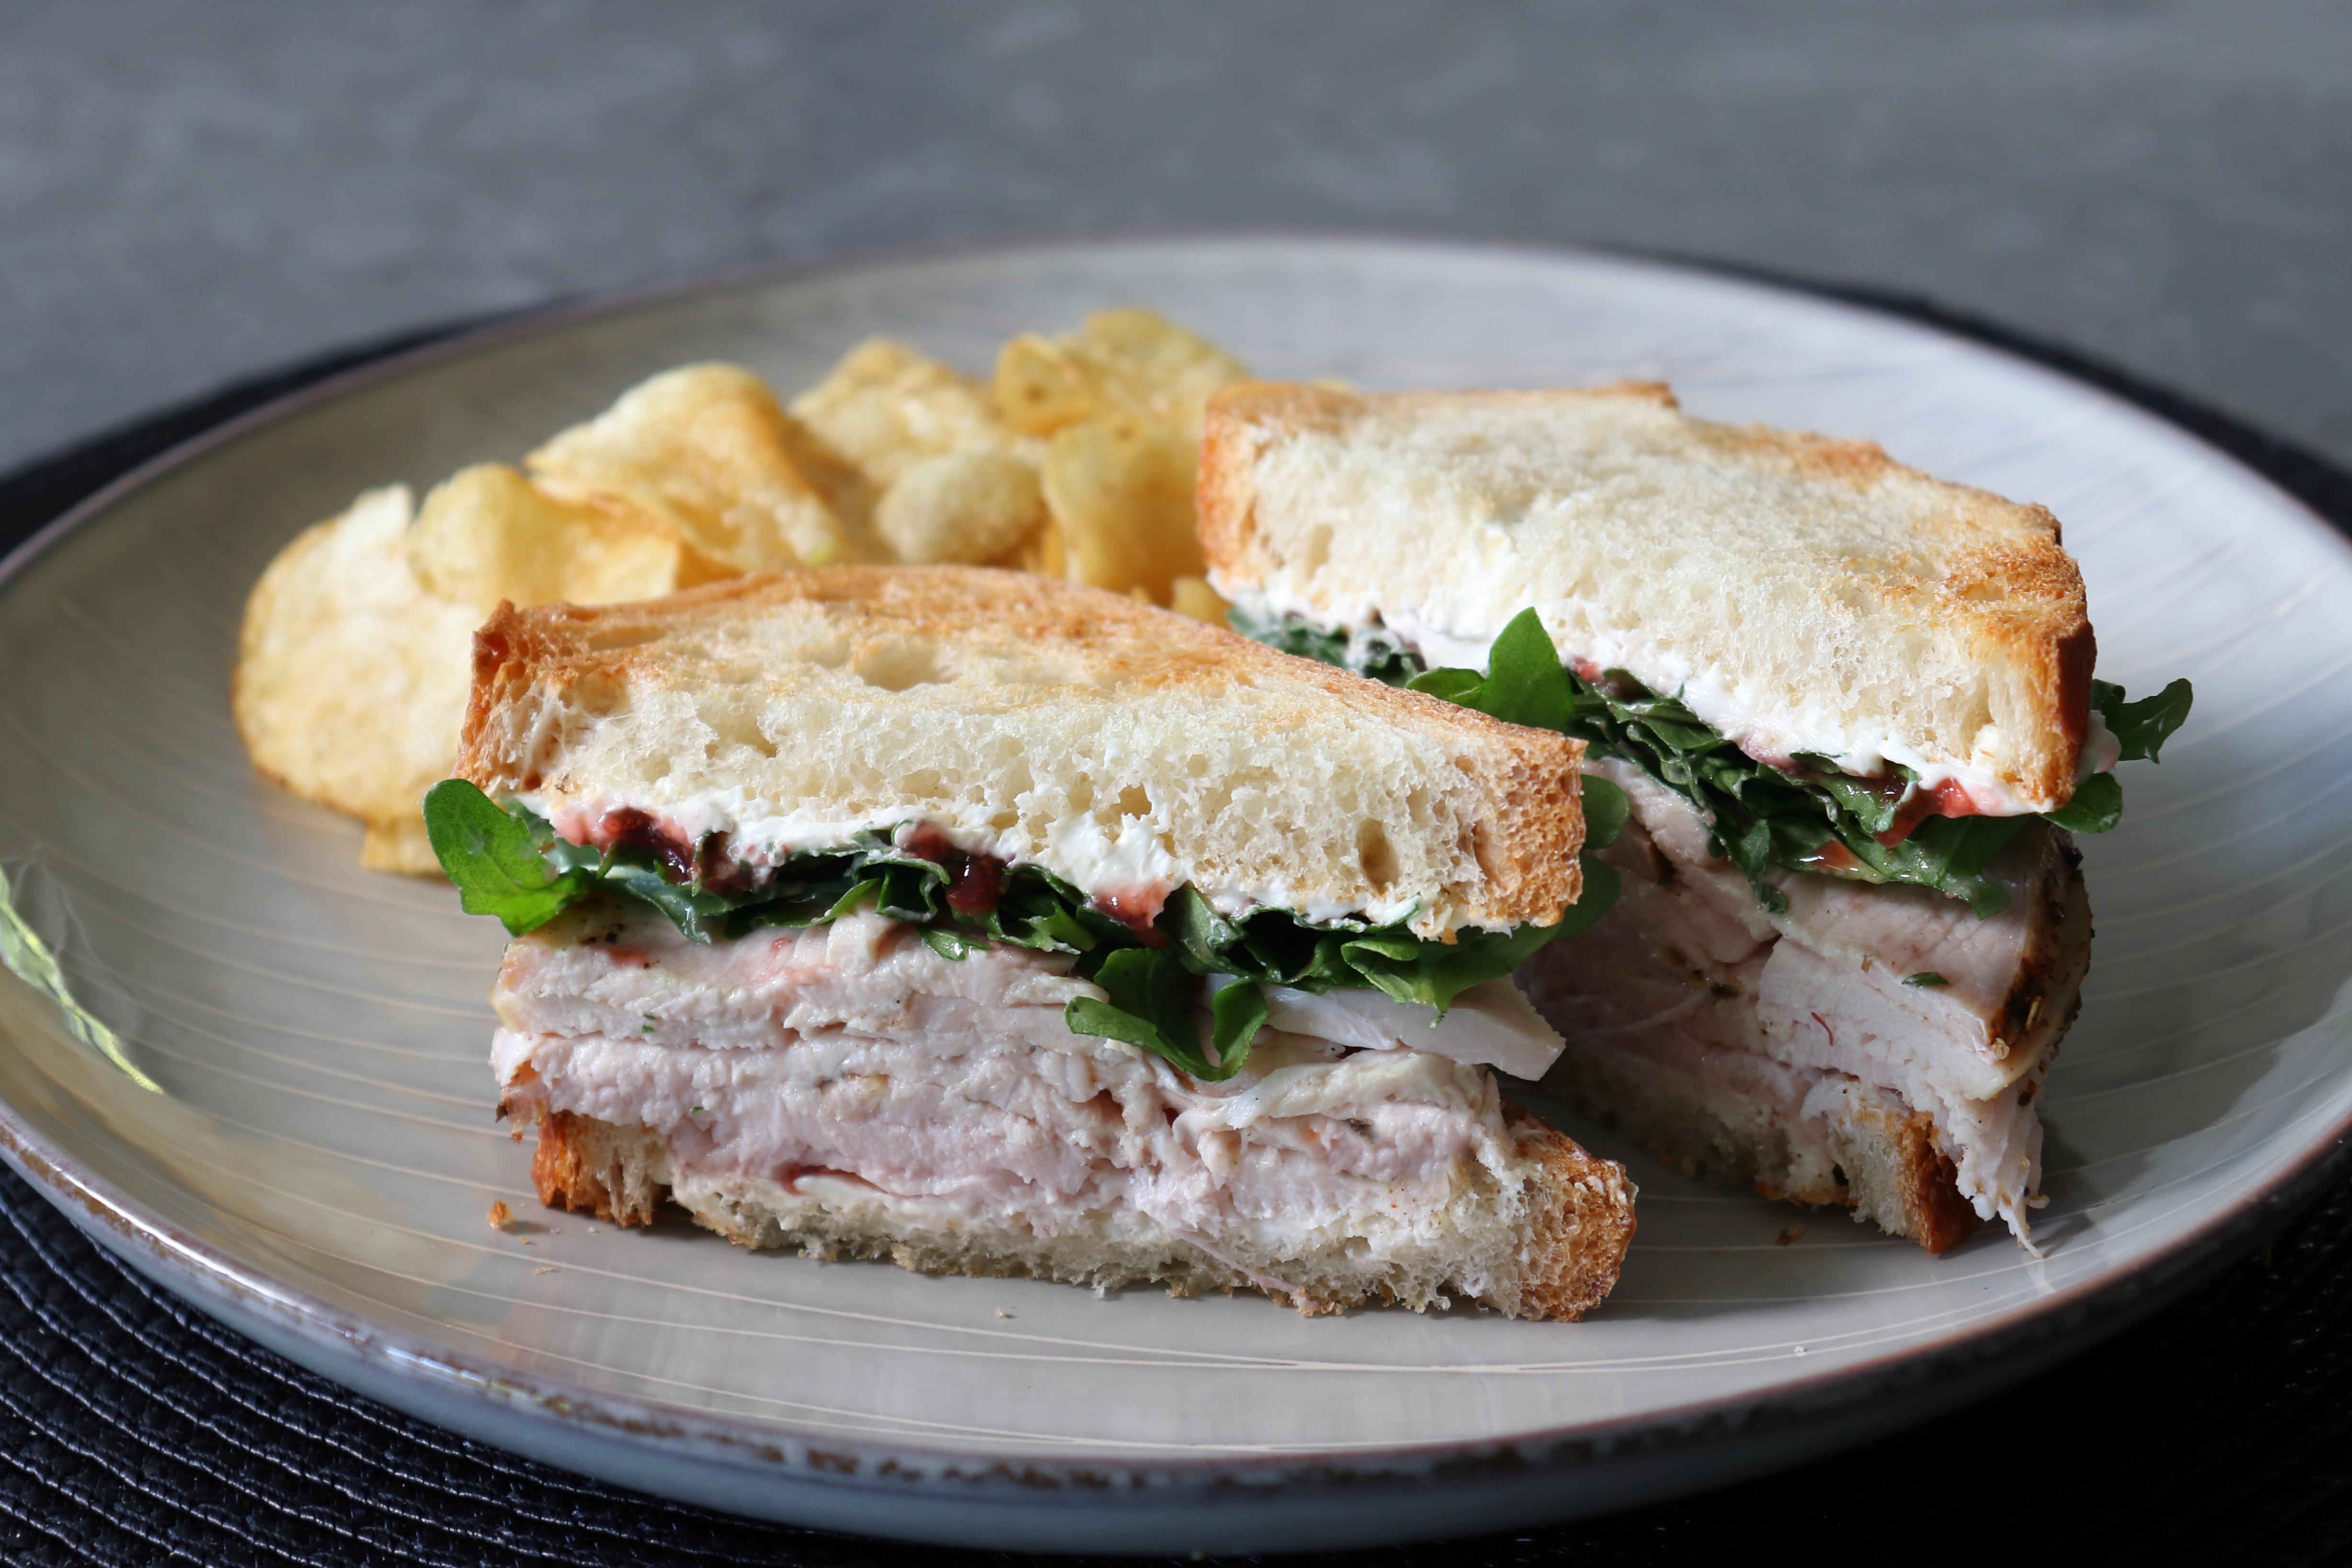 Deli-Style Roast Turkey for Sandwiches Chef John